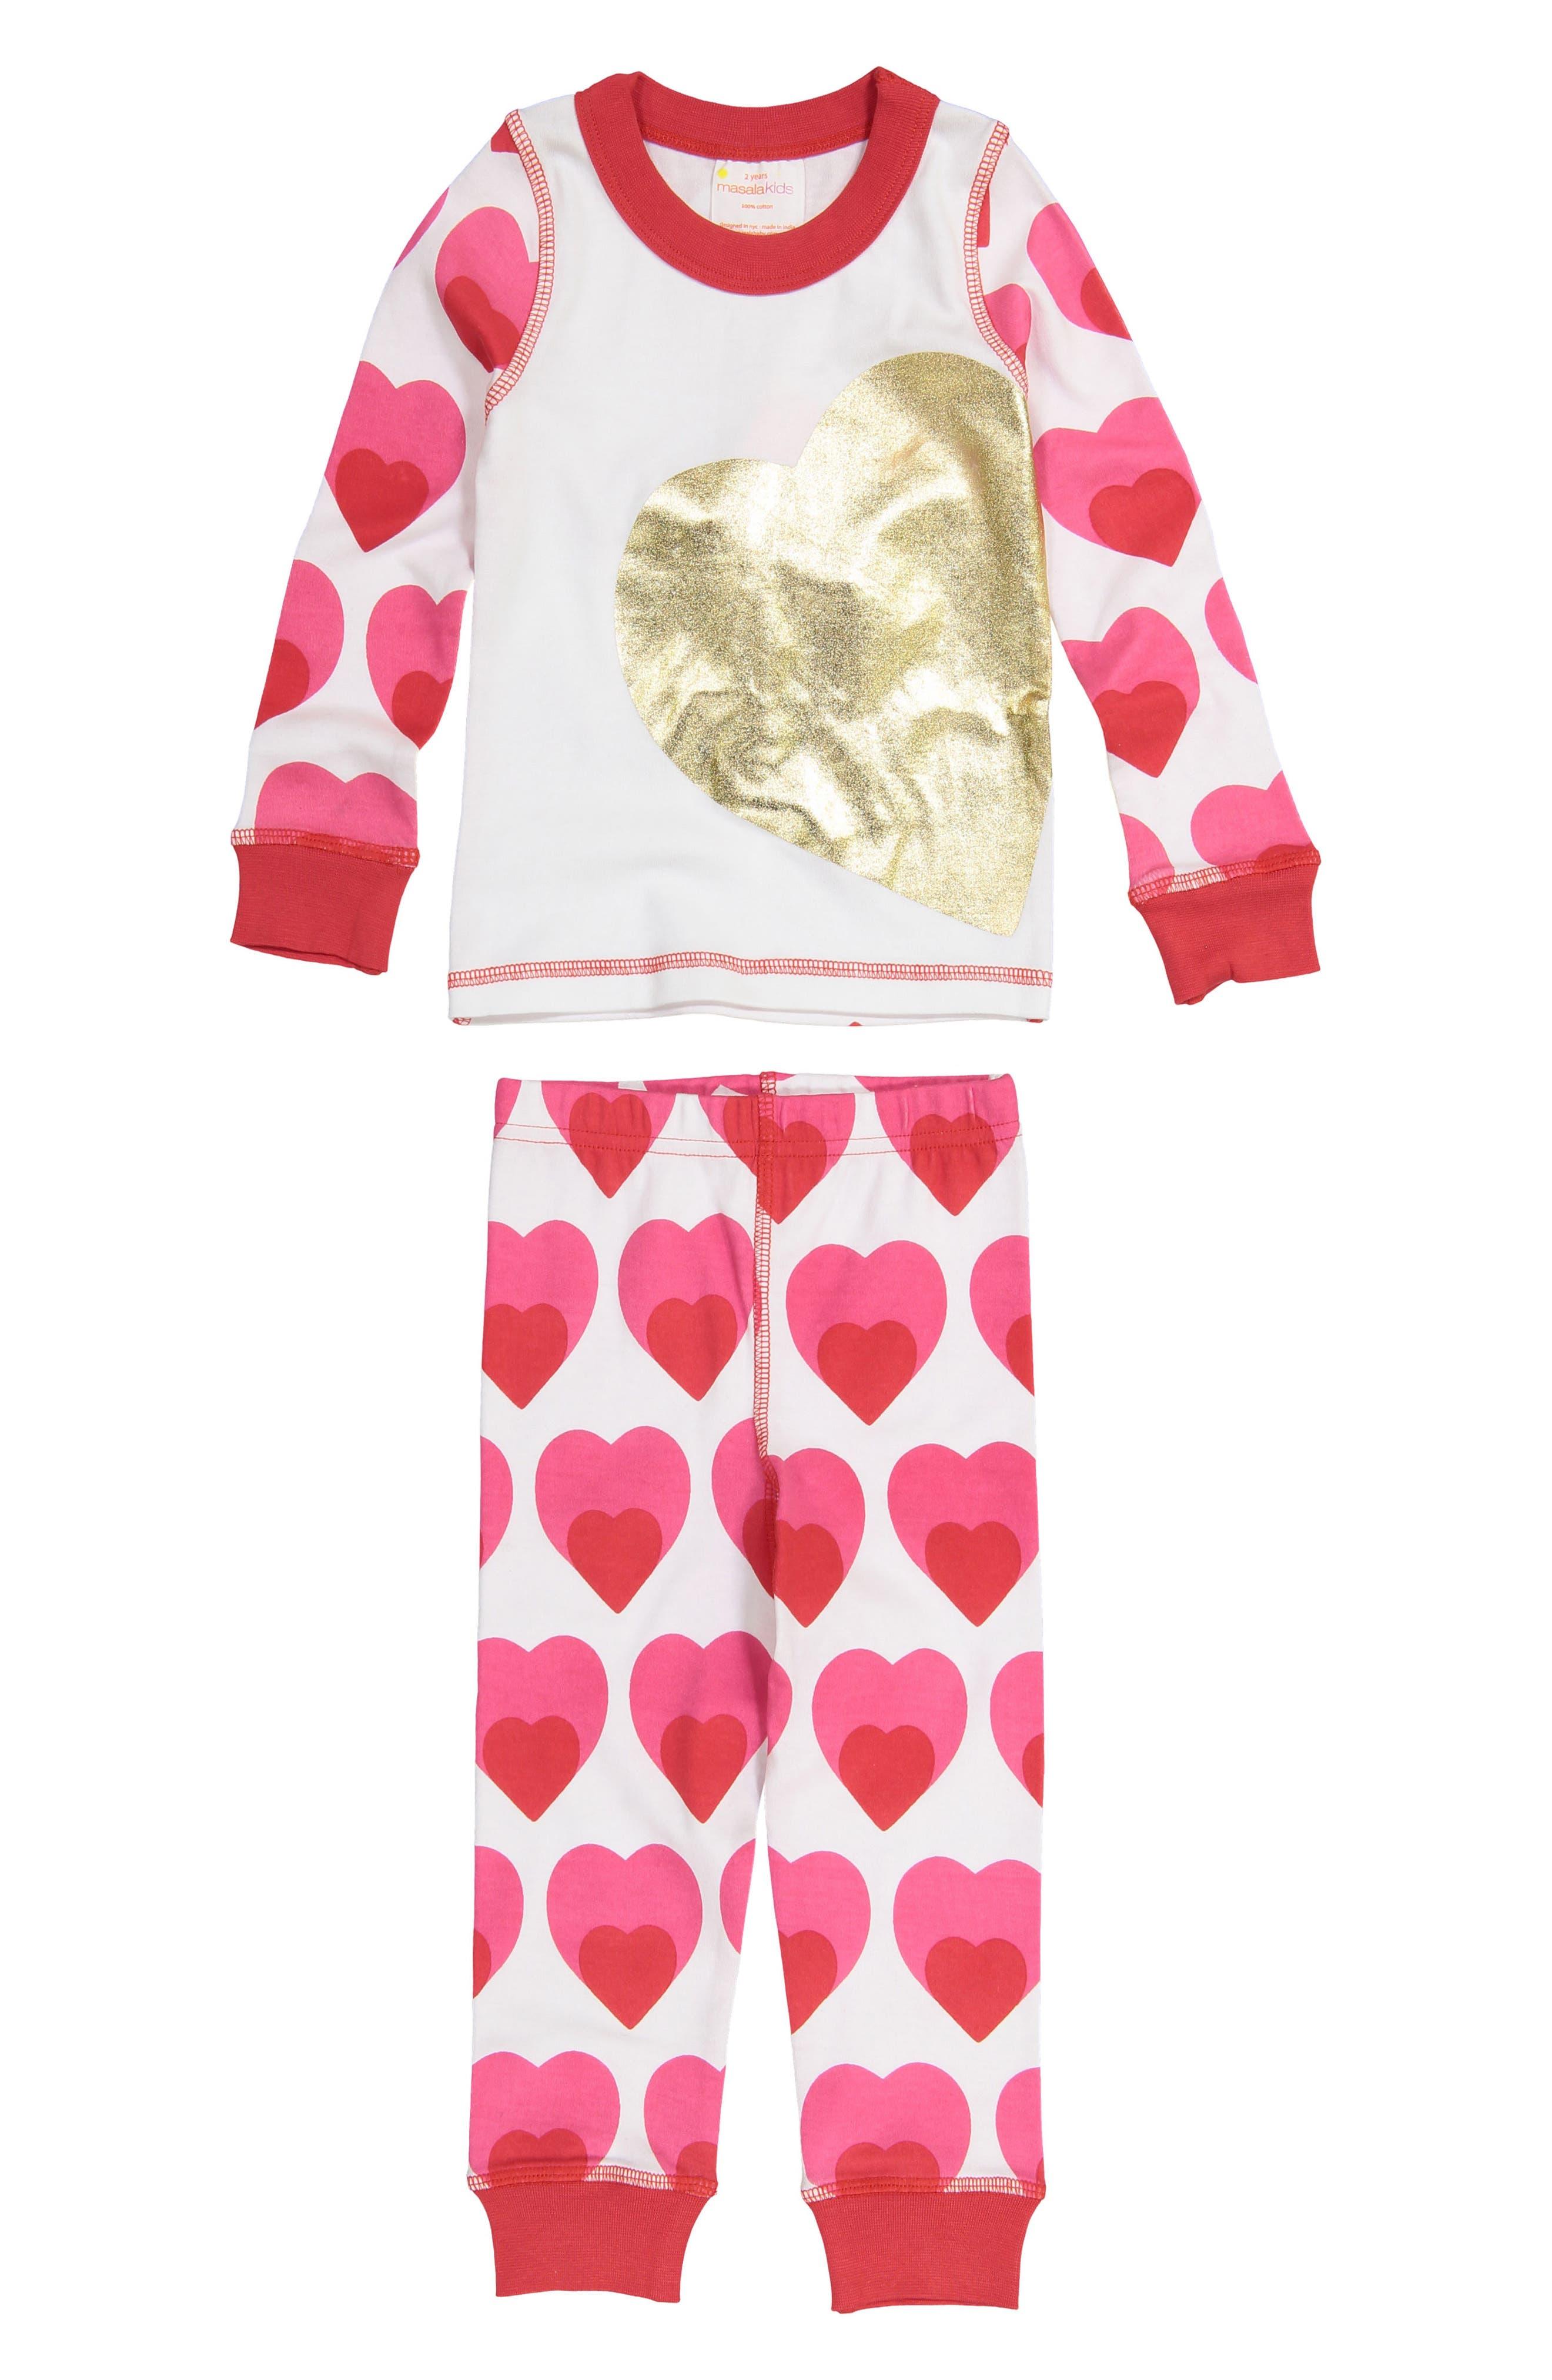 Main Image - Masalababy Big Love Fitted Two-Piece Pajamas (Toddler Girls, Little Girls & Big Girls)